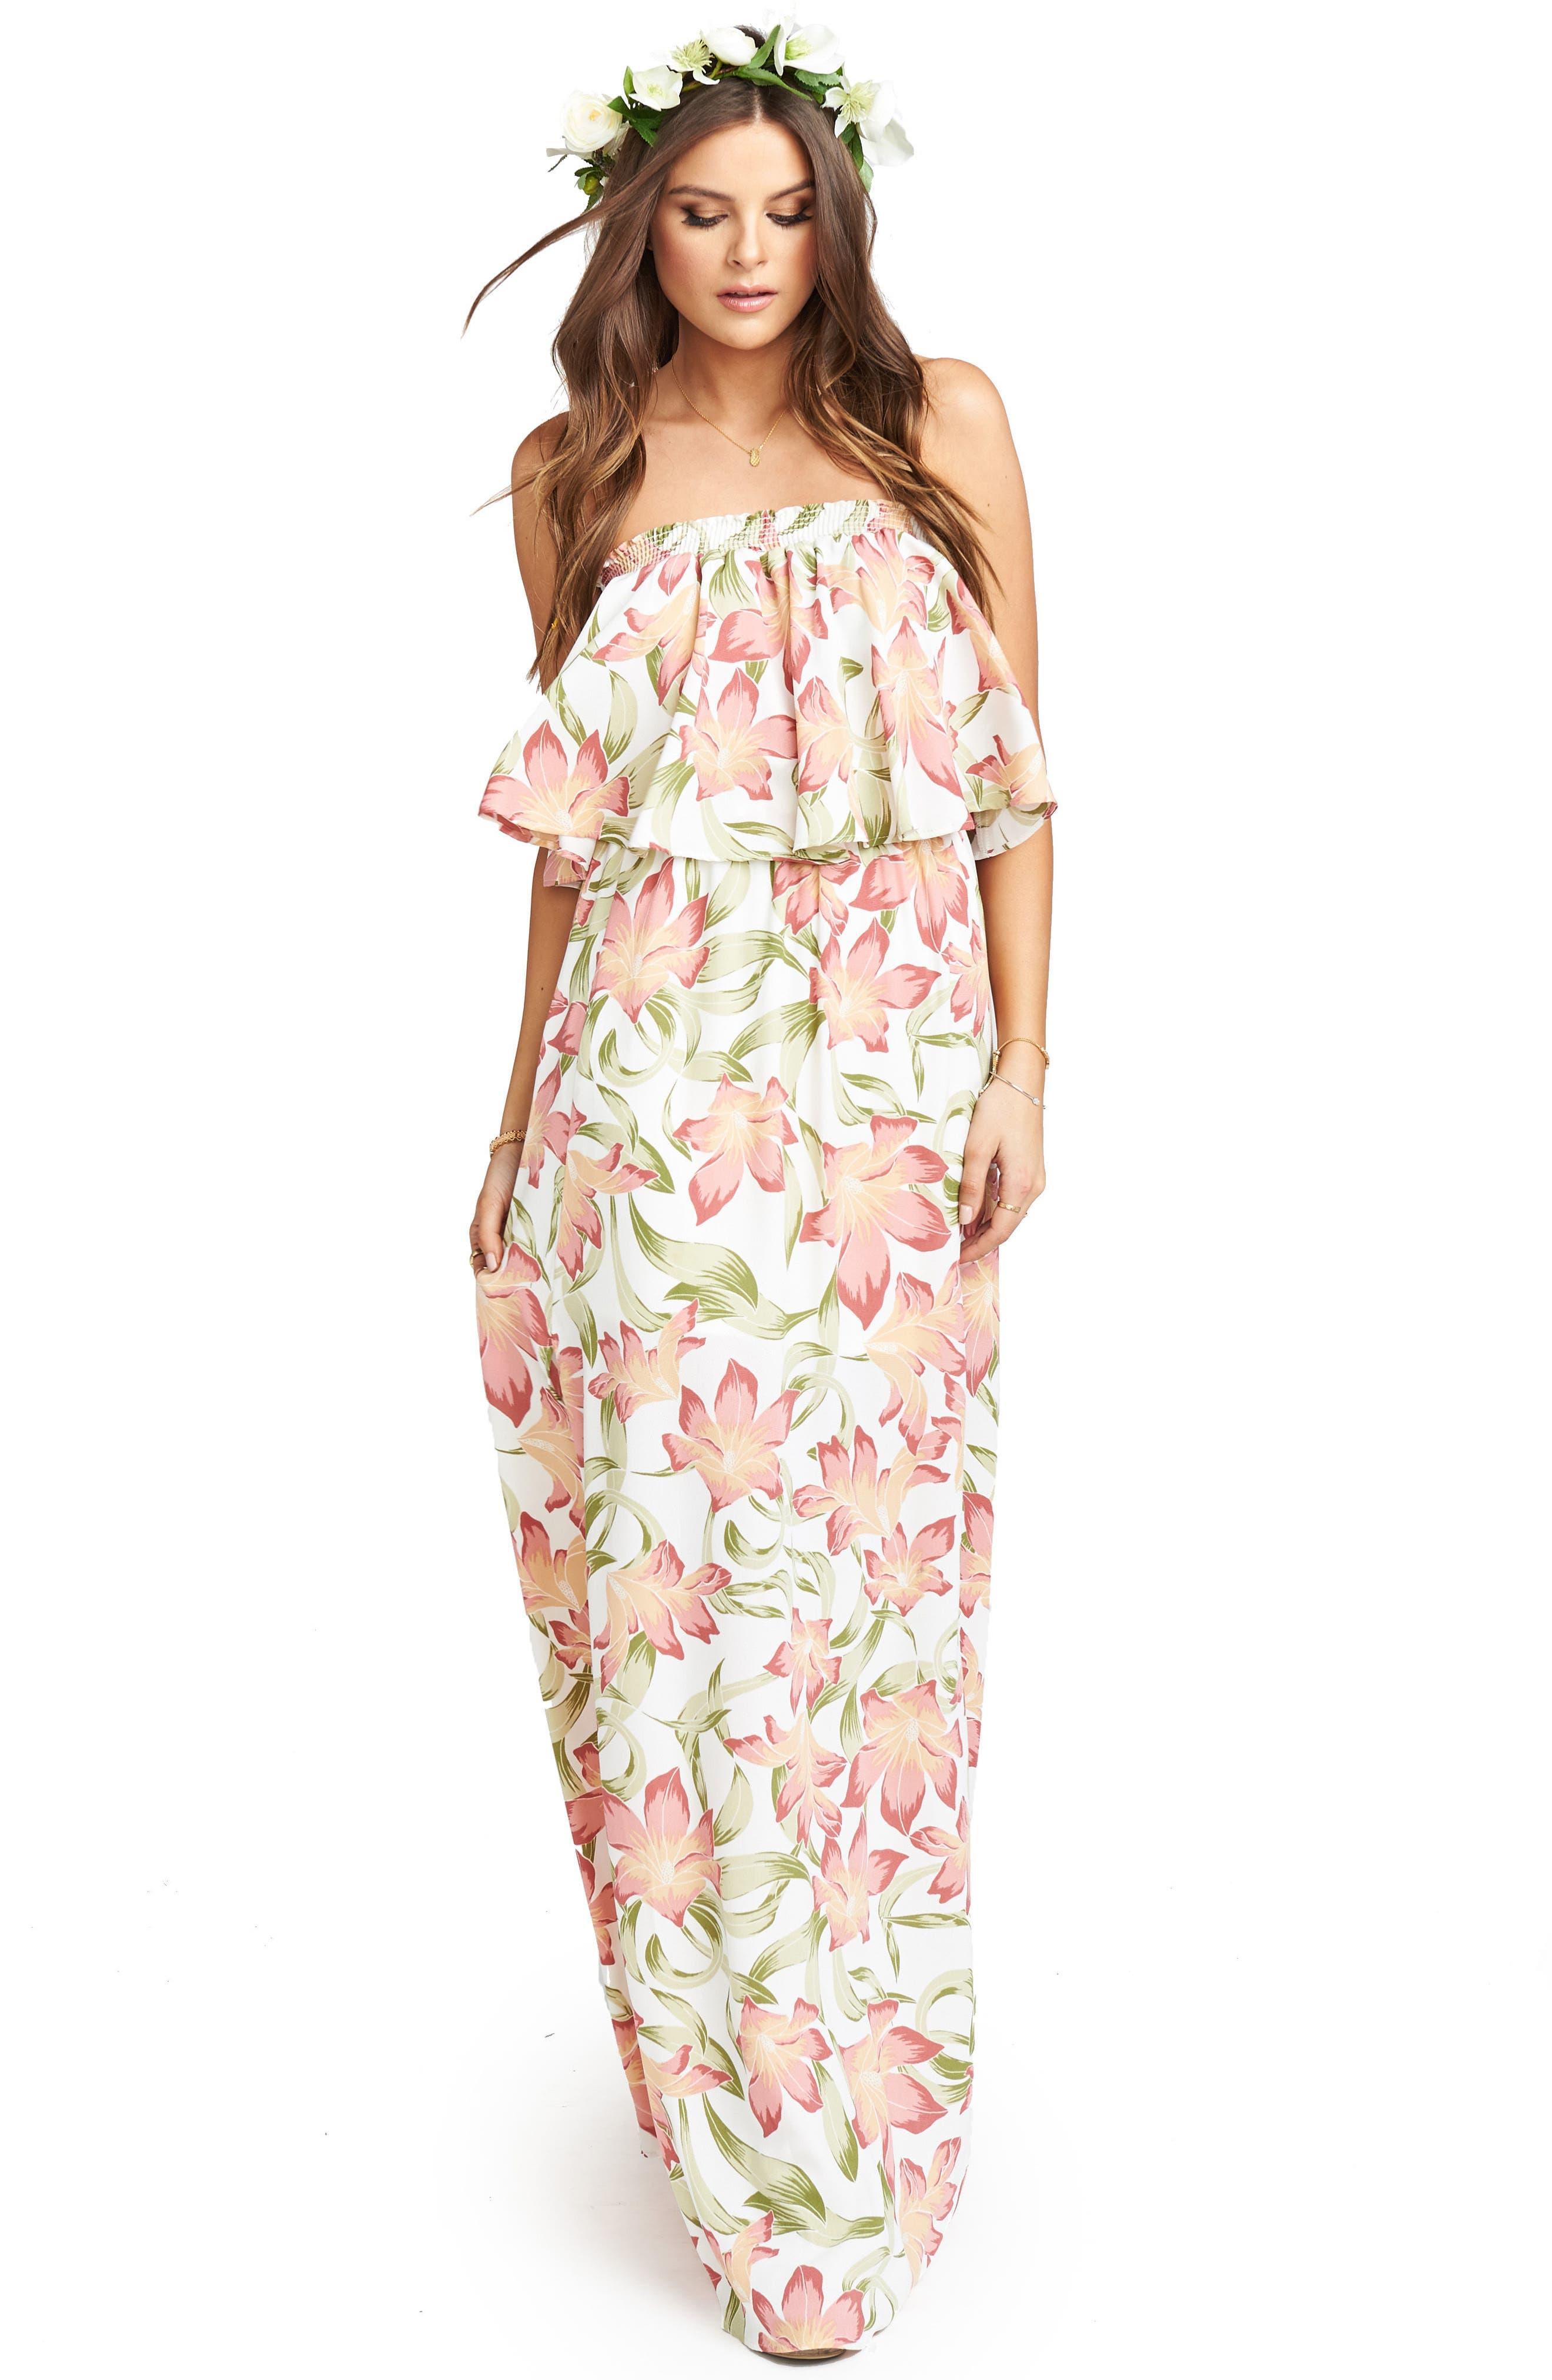 Hacienda Maxi Dress,                             Alternate thumbnail 4, color,                             Lily Lady Crepe